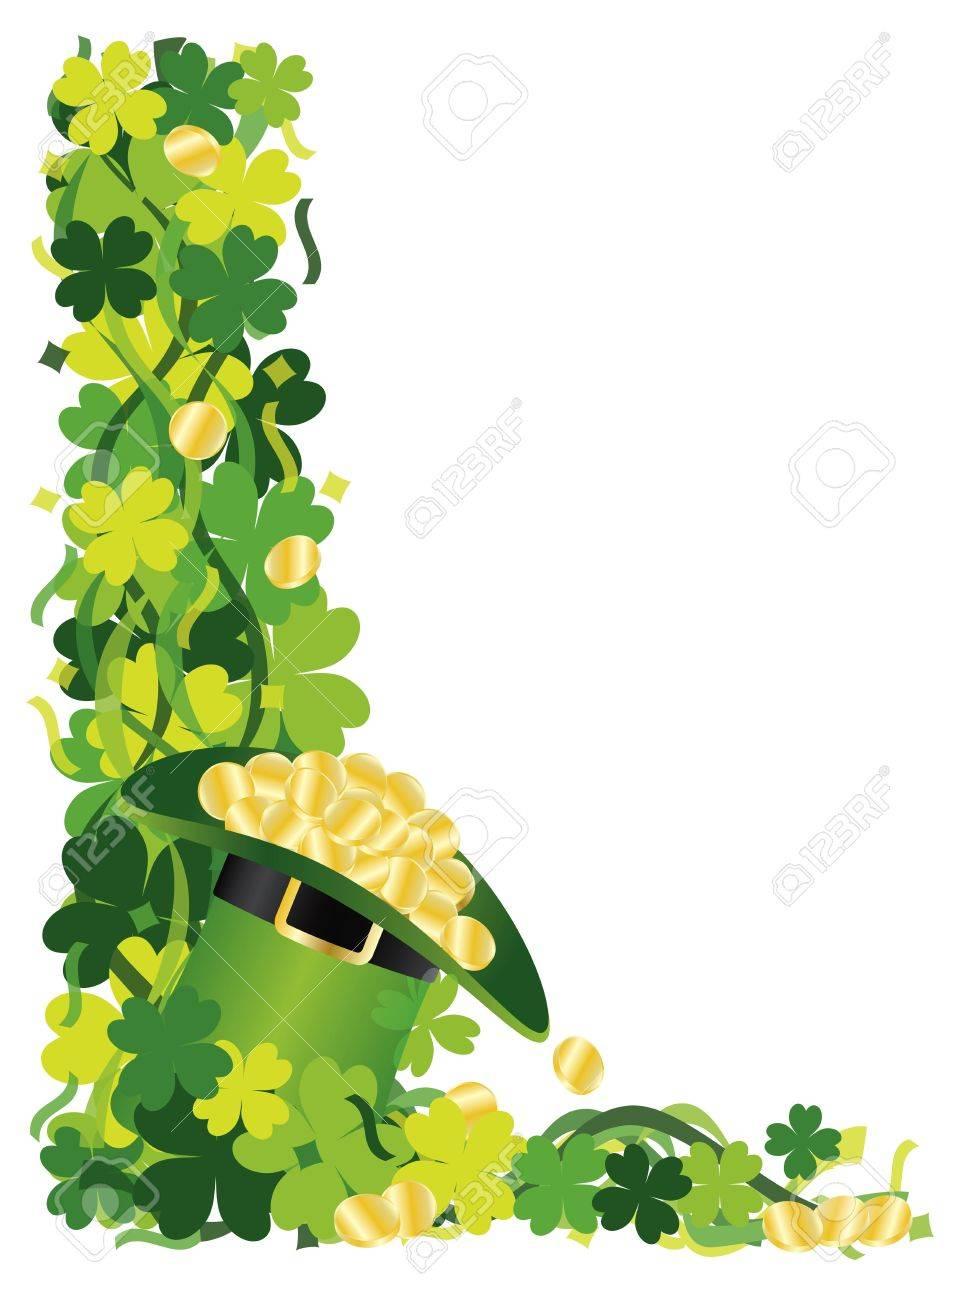 st patricks day irish lucky four leaf clover with leprechaun